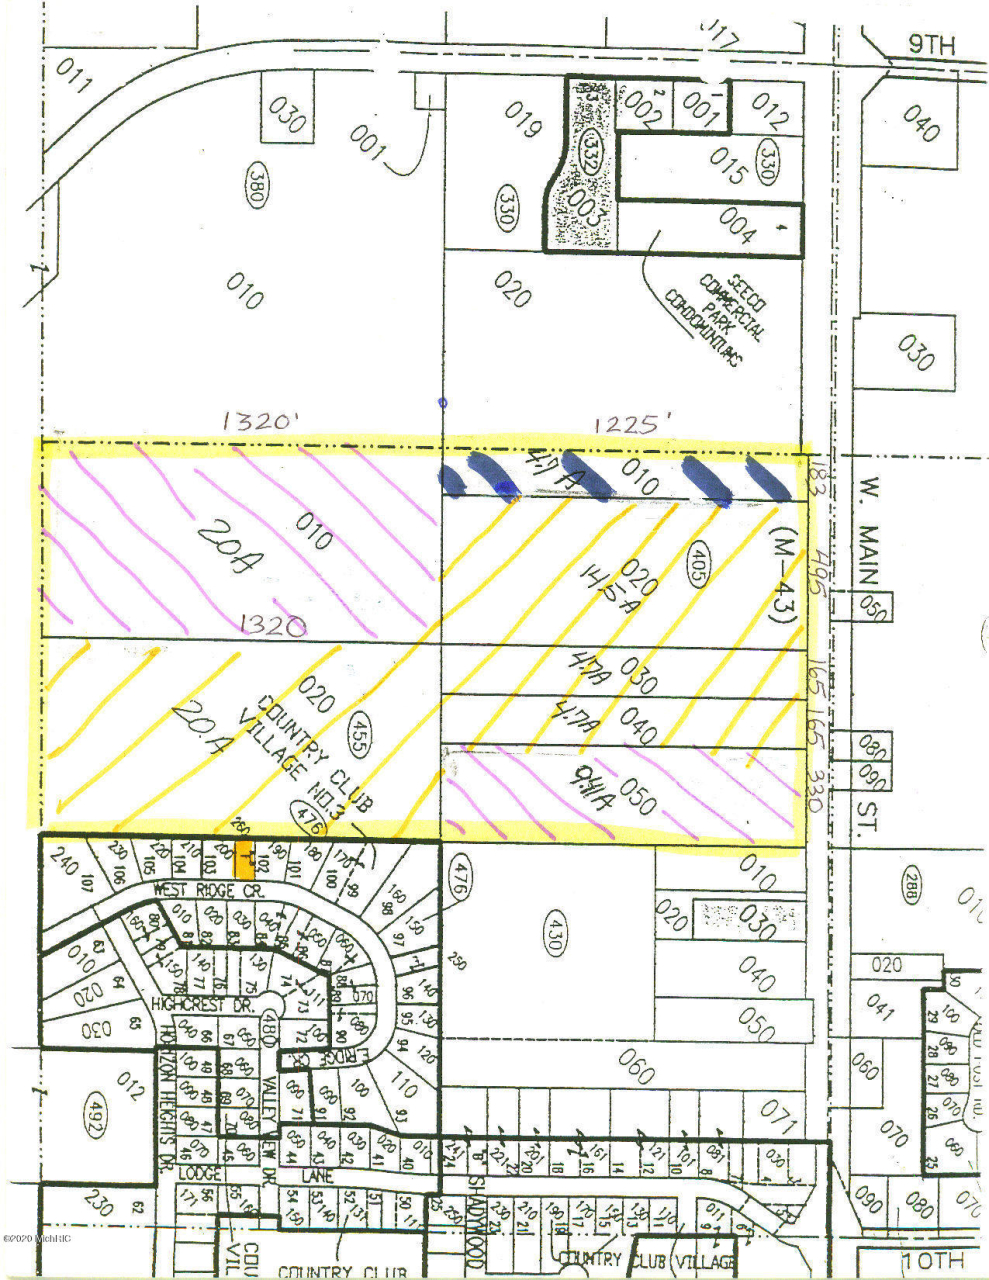 6479 W Main St Kalamazoo, MI 49009